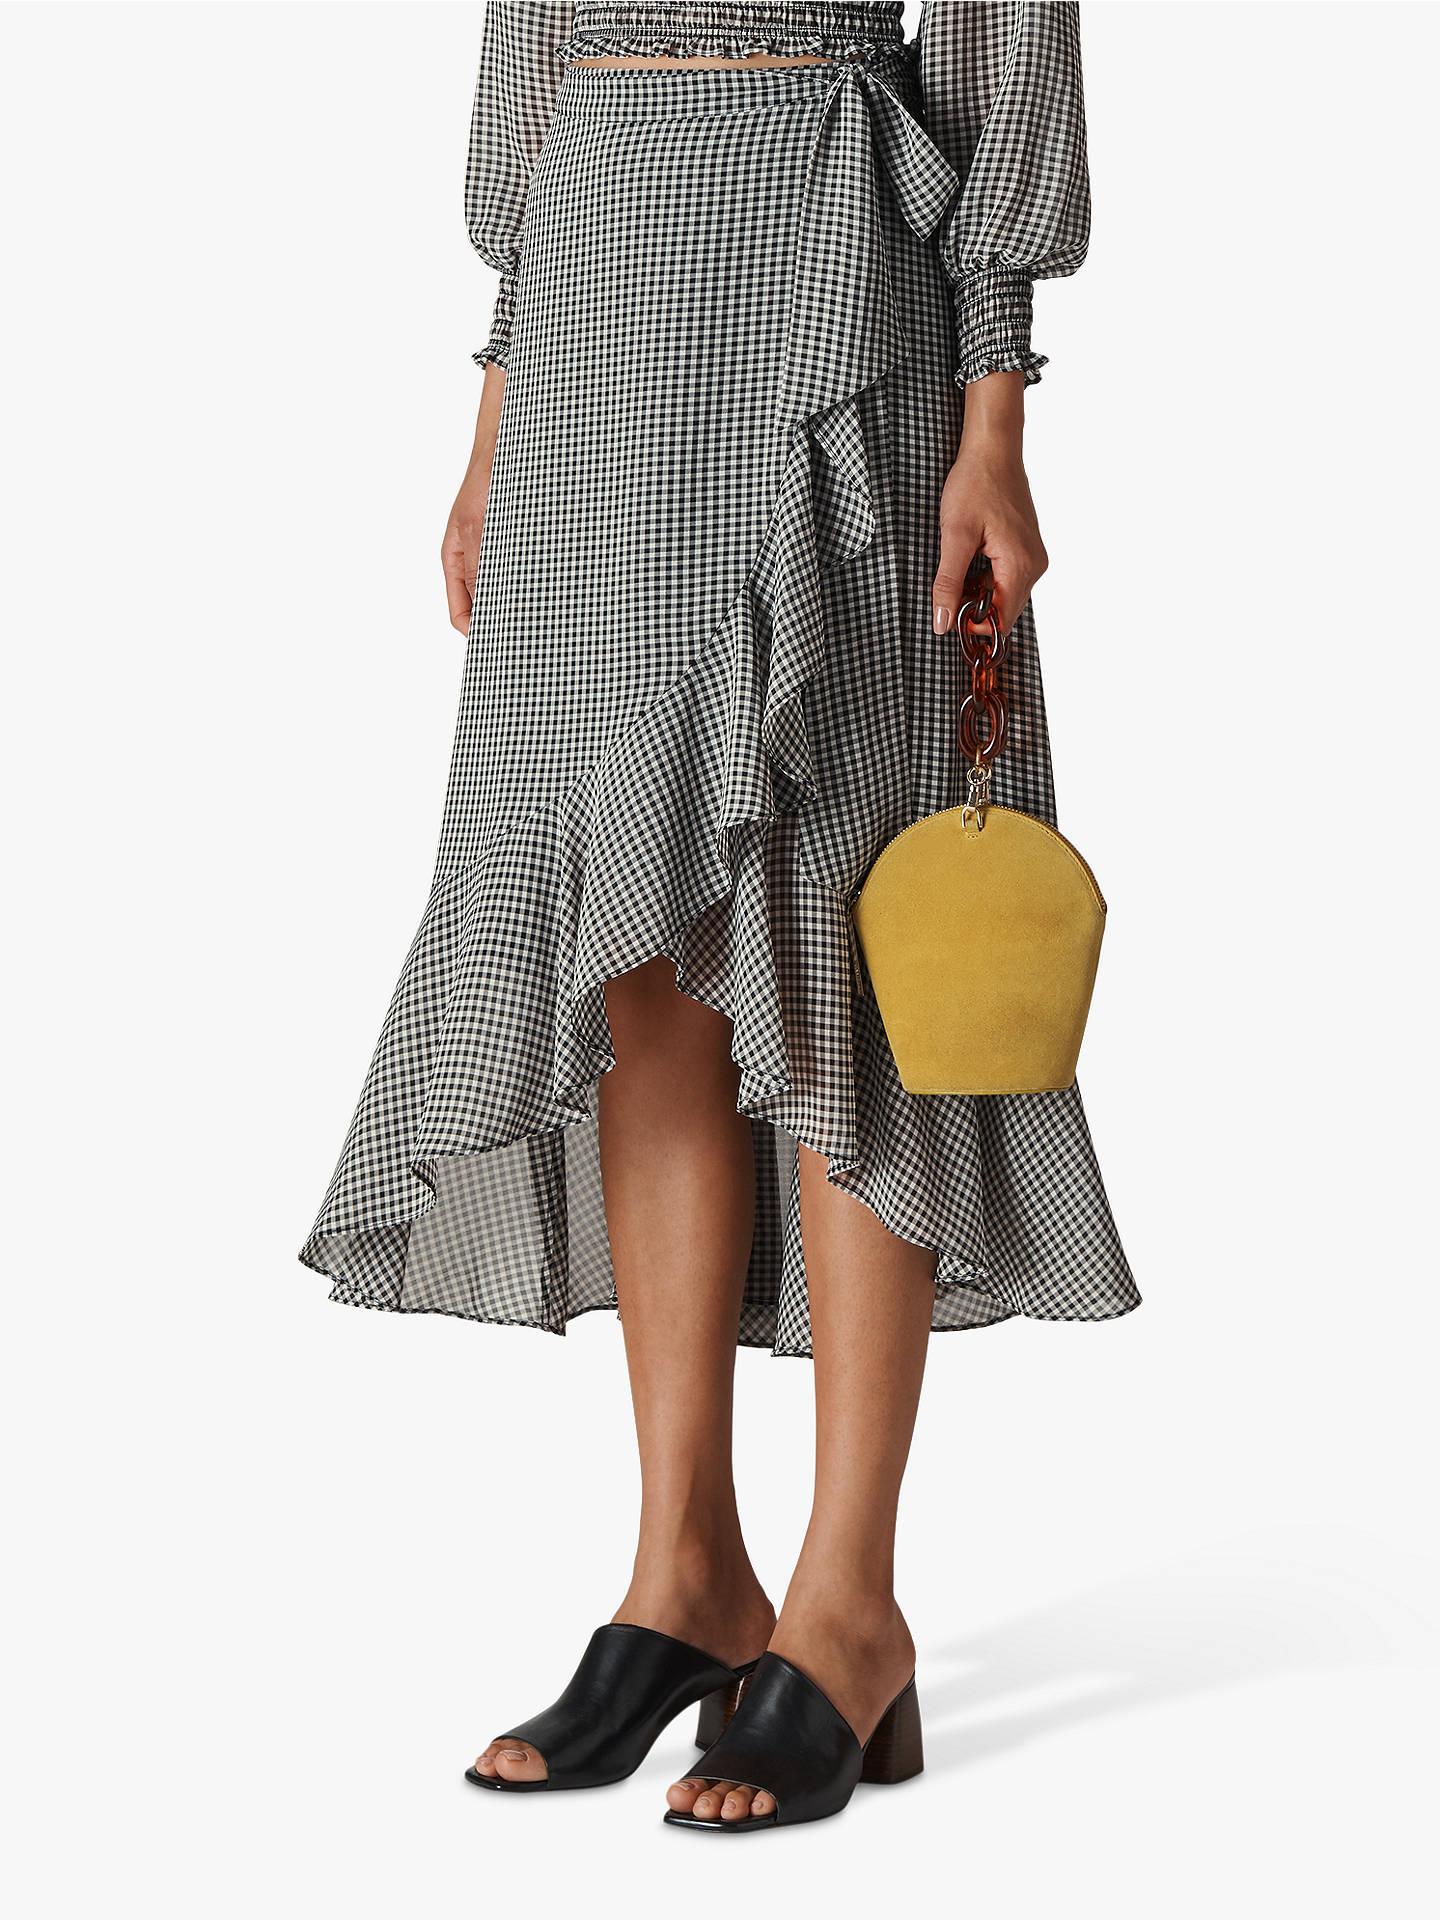 half off good service designer fashion Whistles Gingham Wrap Midi Skirt, Black/White at John Lewis & Partners